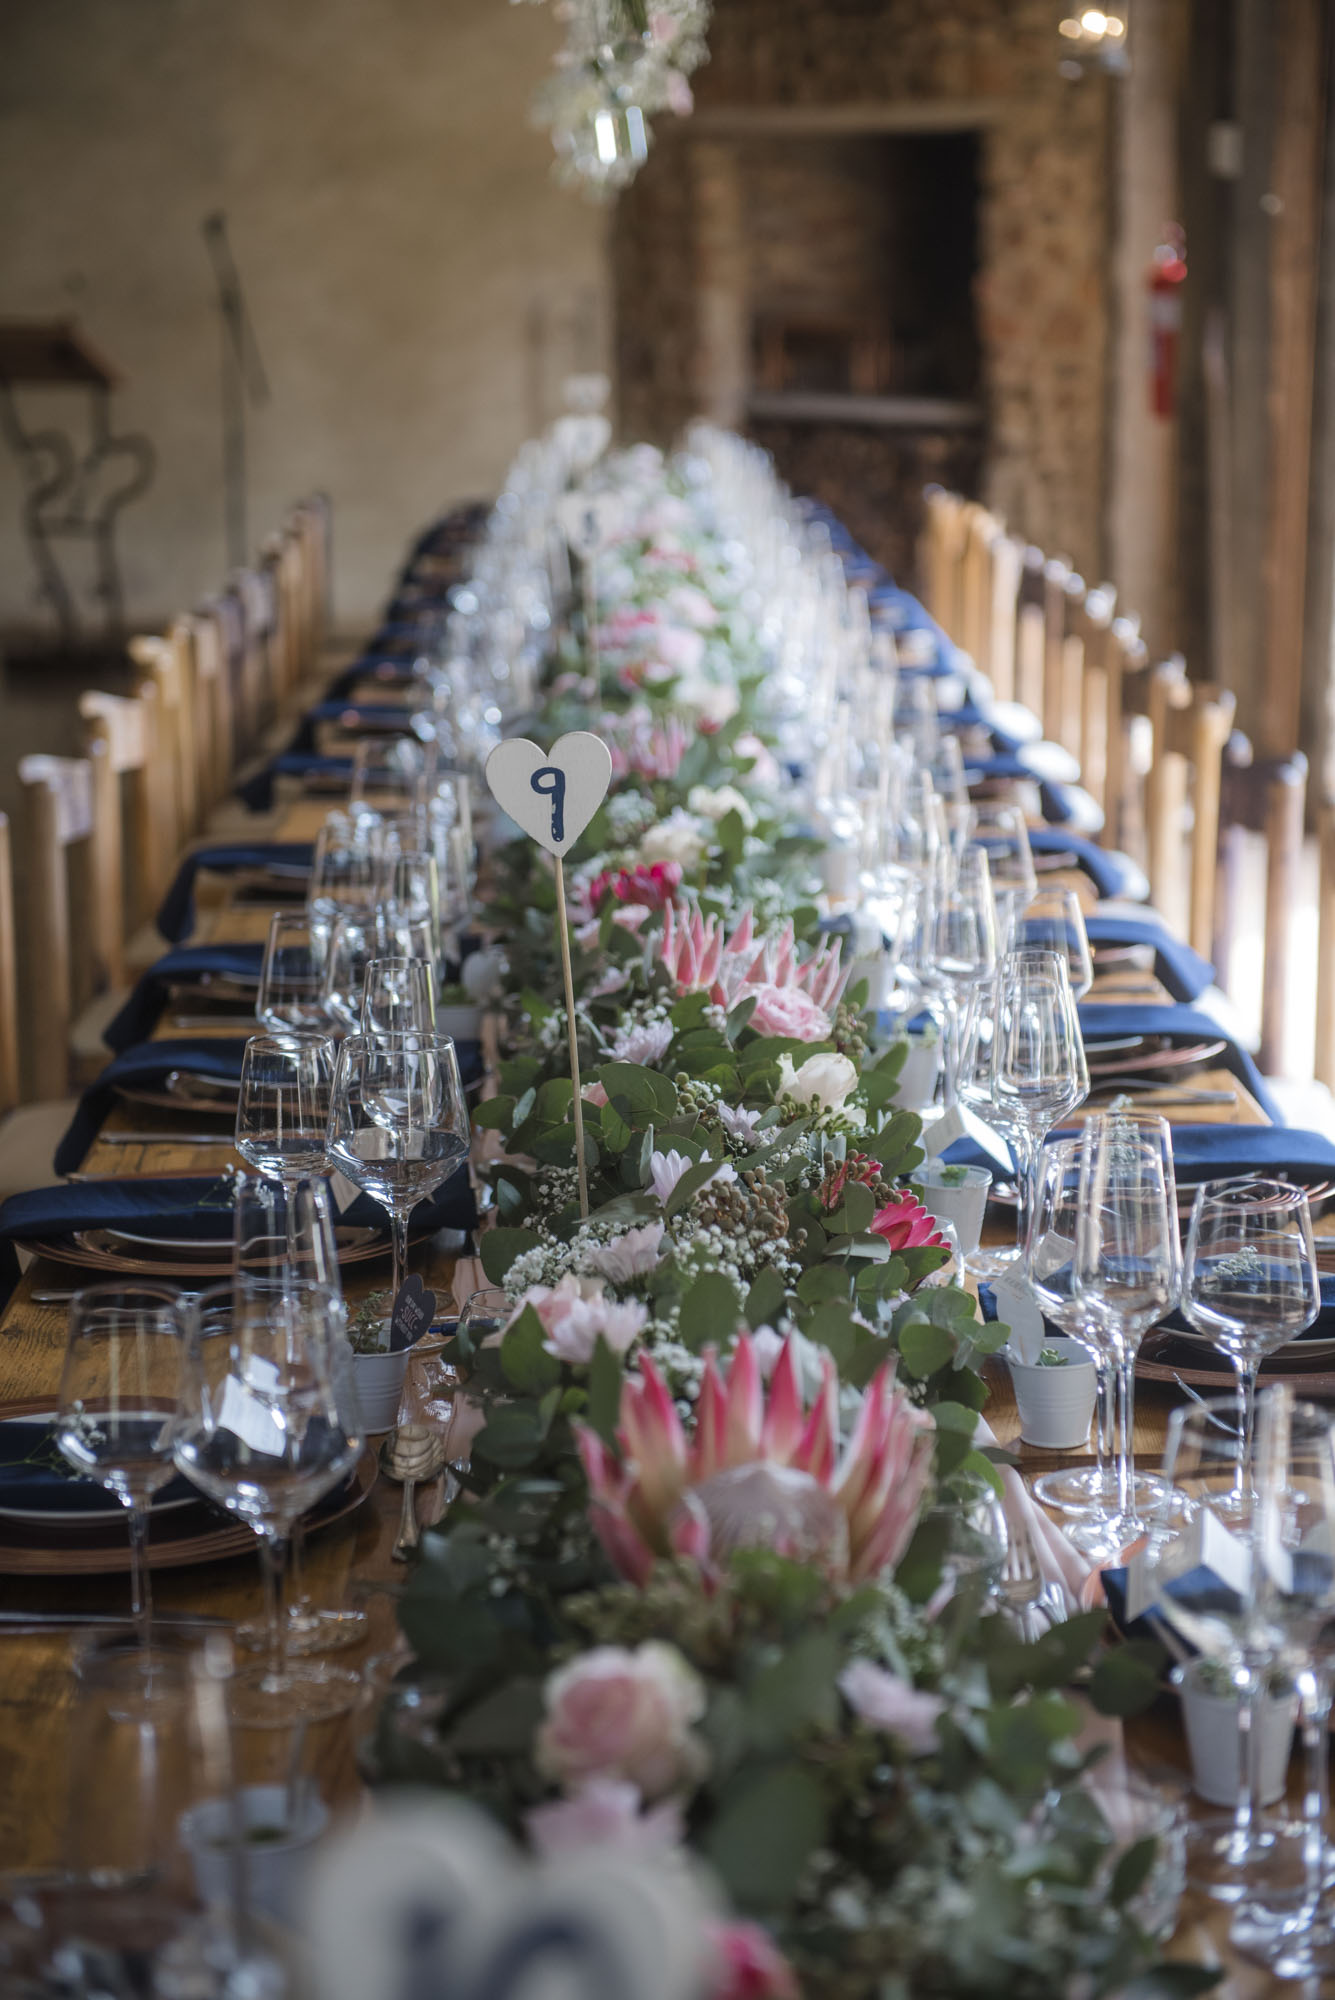 001aaa-johannesburg-wedding-photographers.-johannesburg-wedding-photographers001aaa-johannesburg-wedding-photographers.jpg